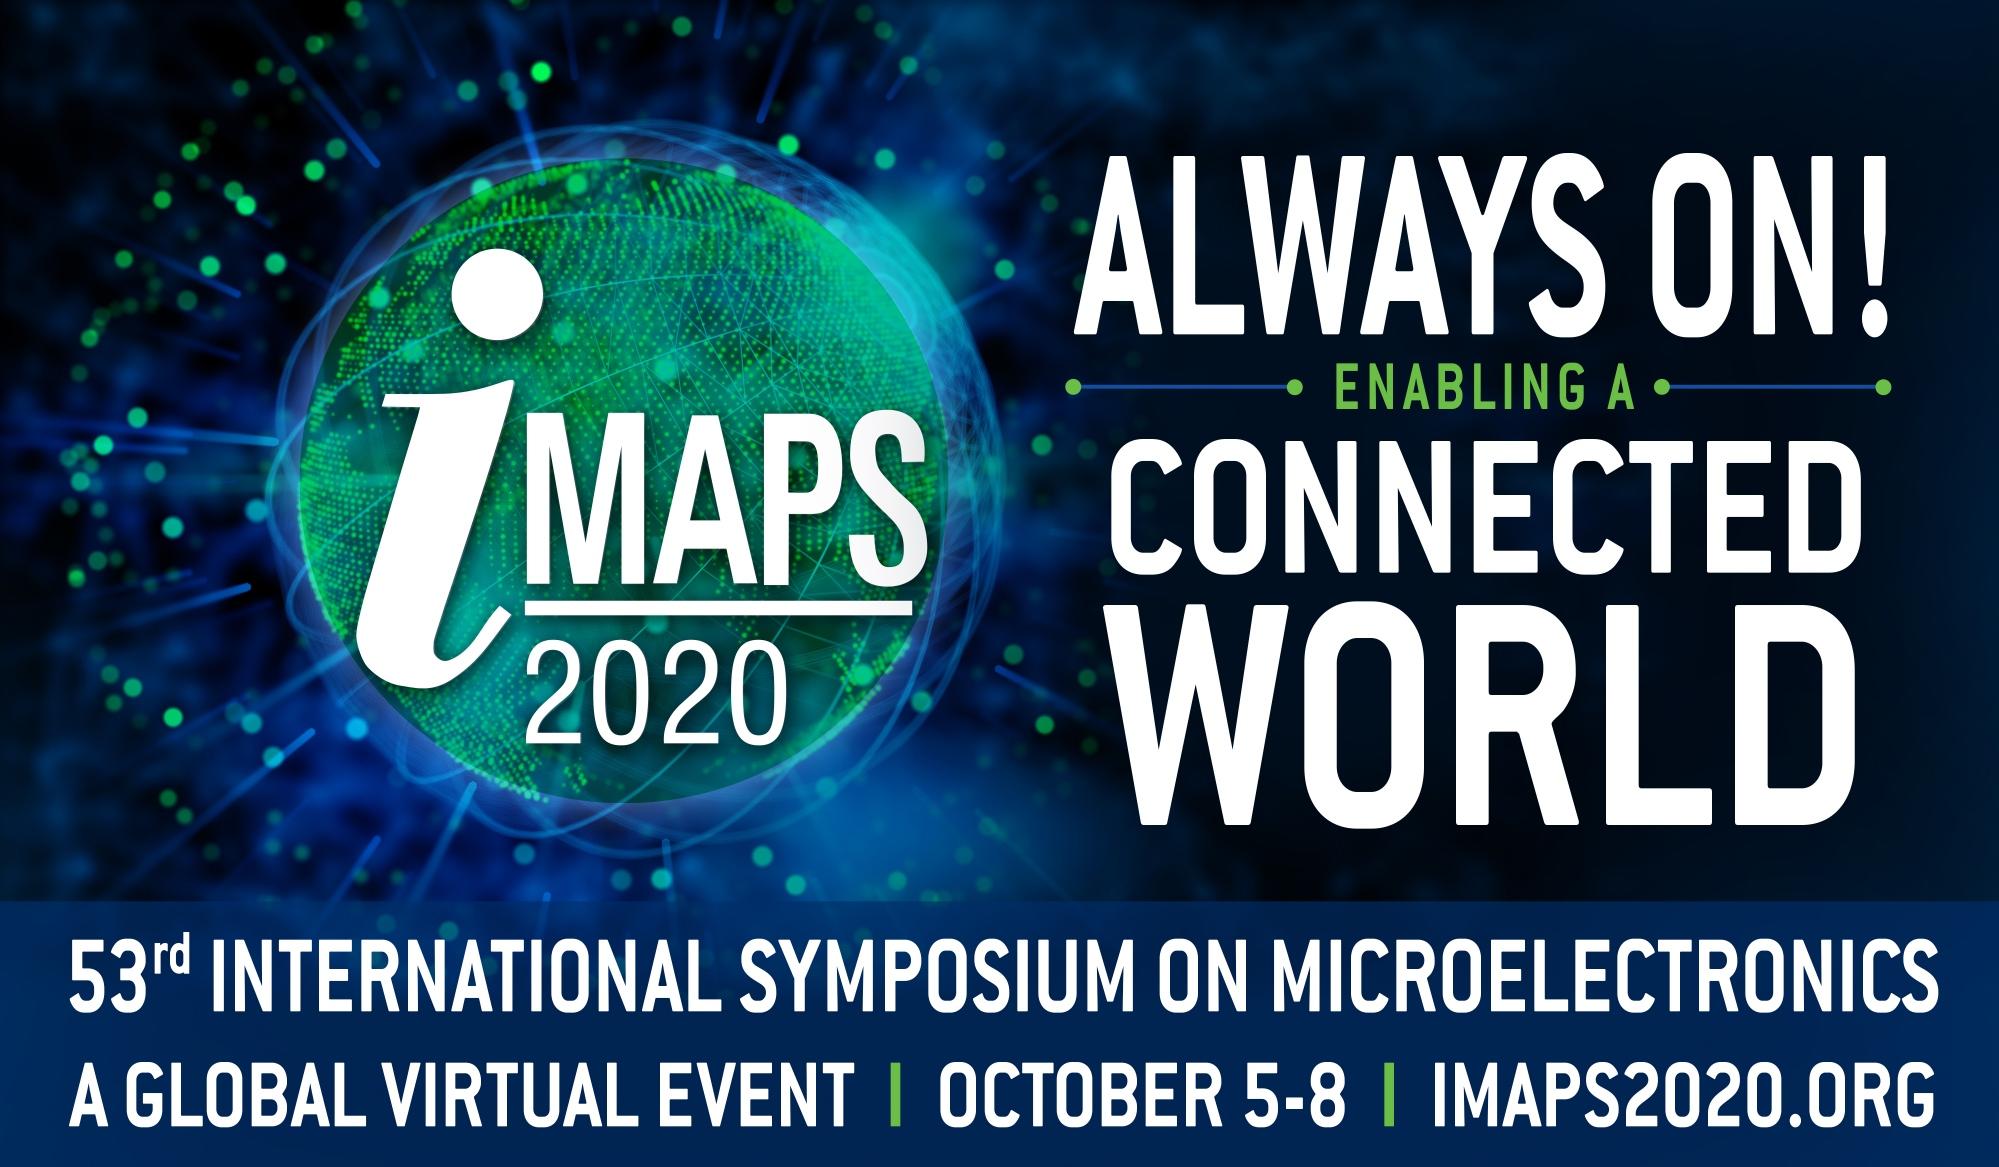 Event Image - International Symposium on Microelectronics